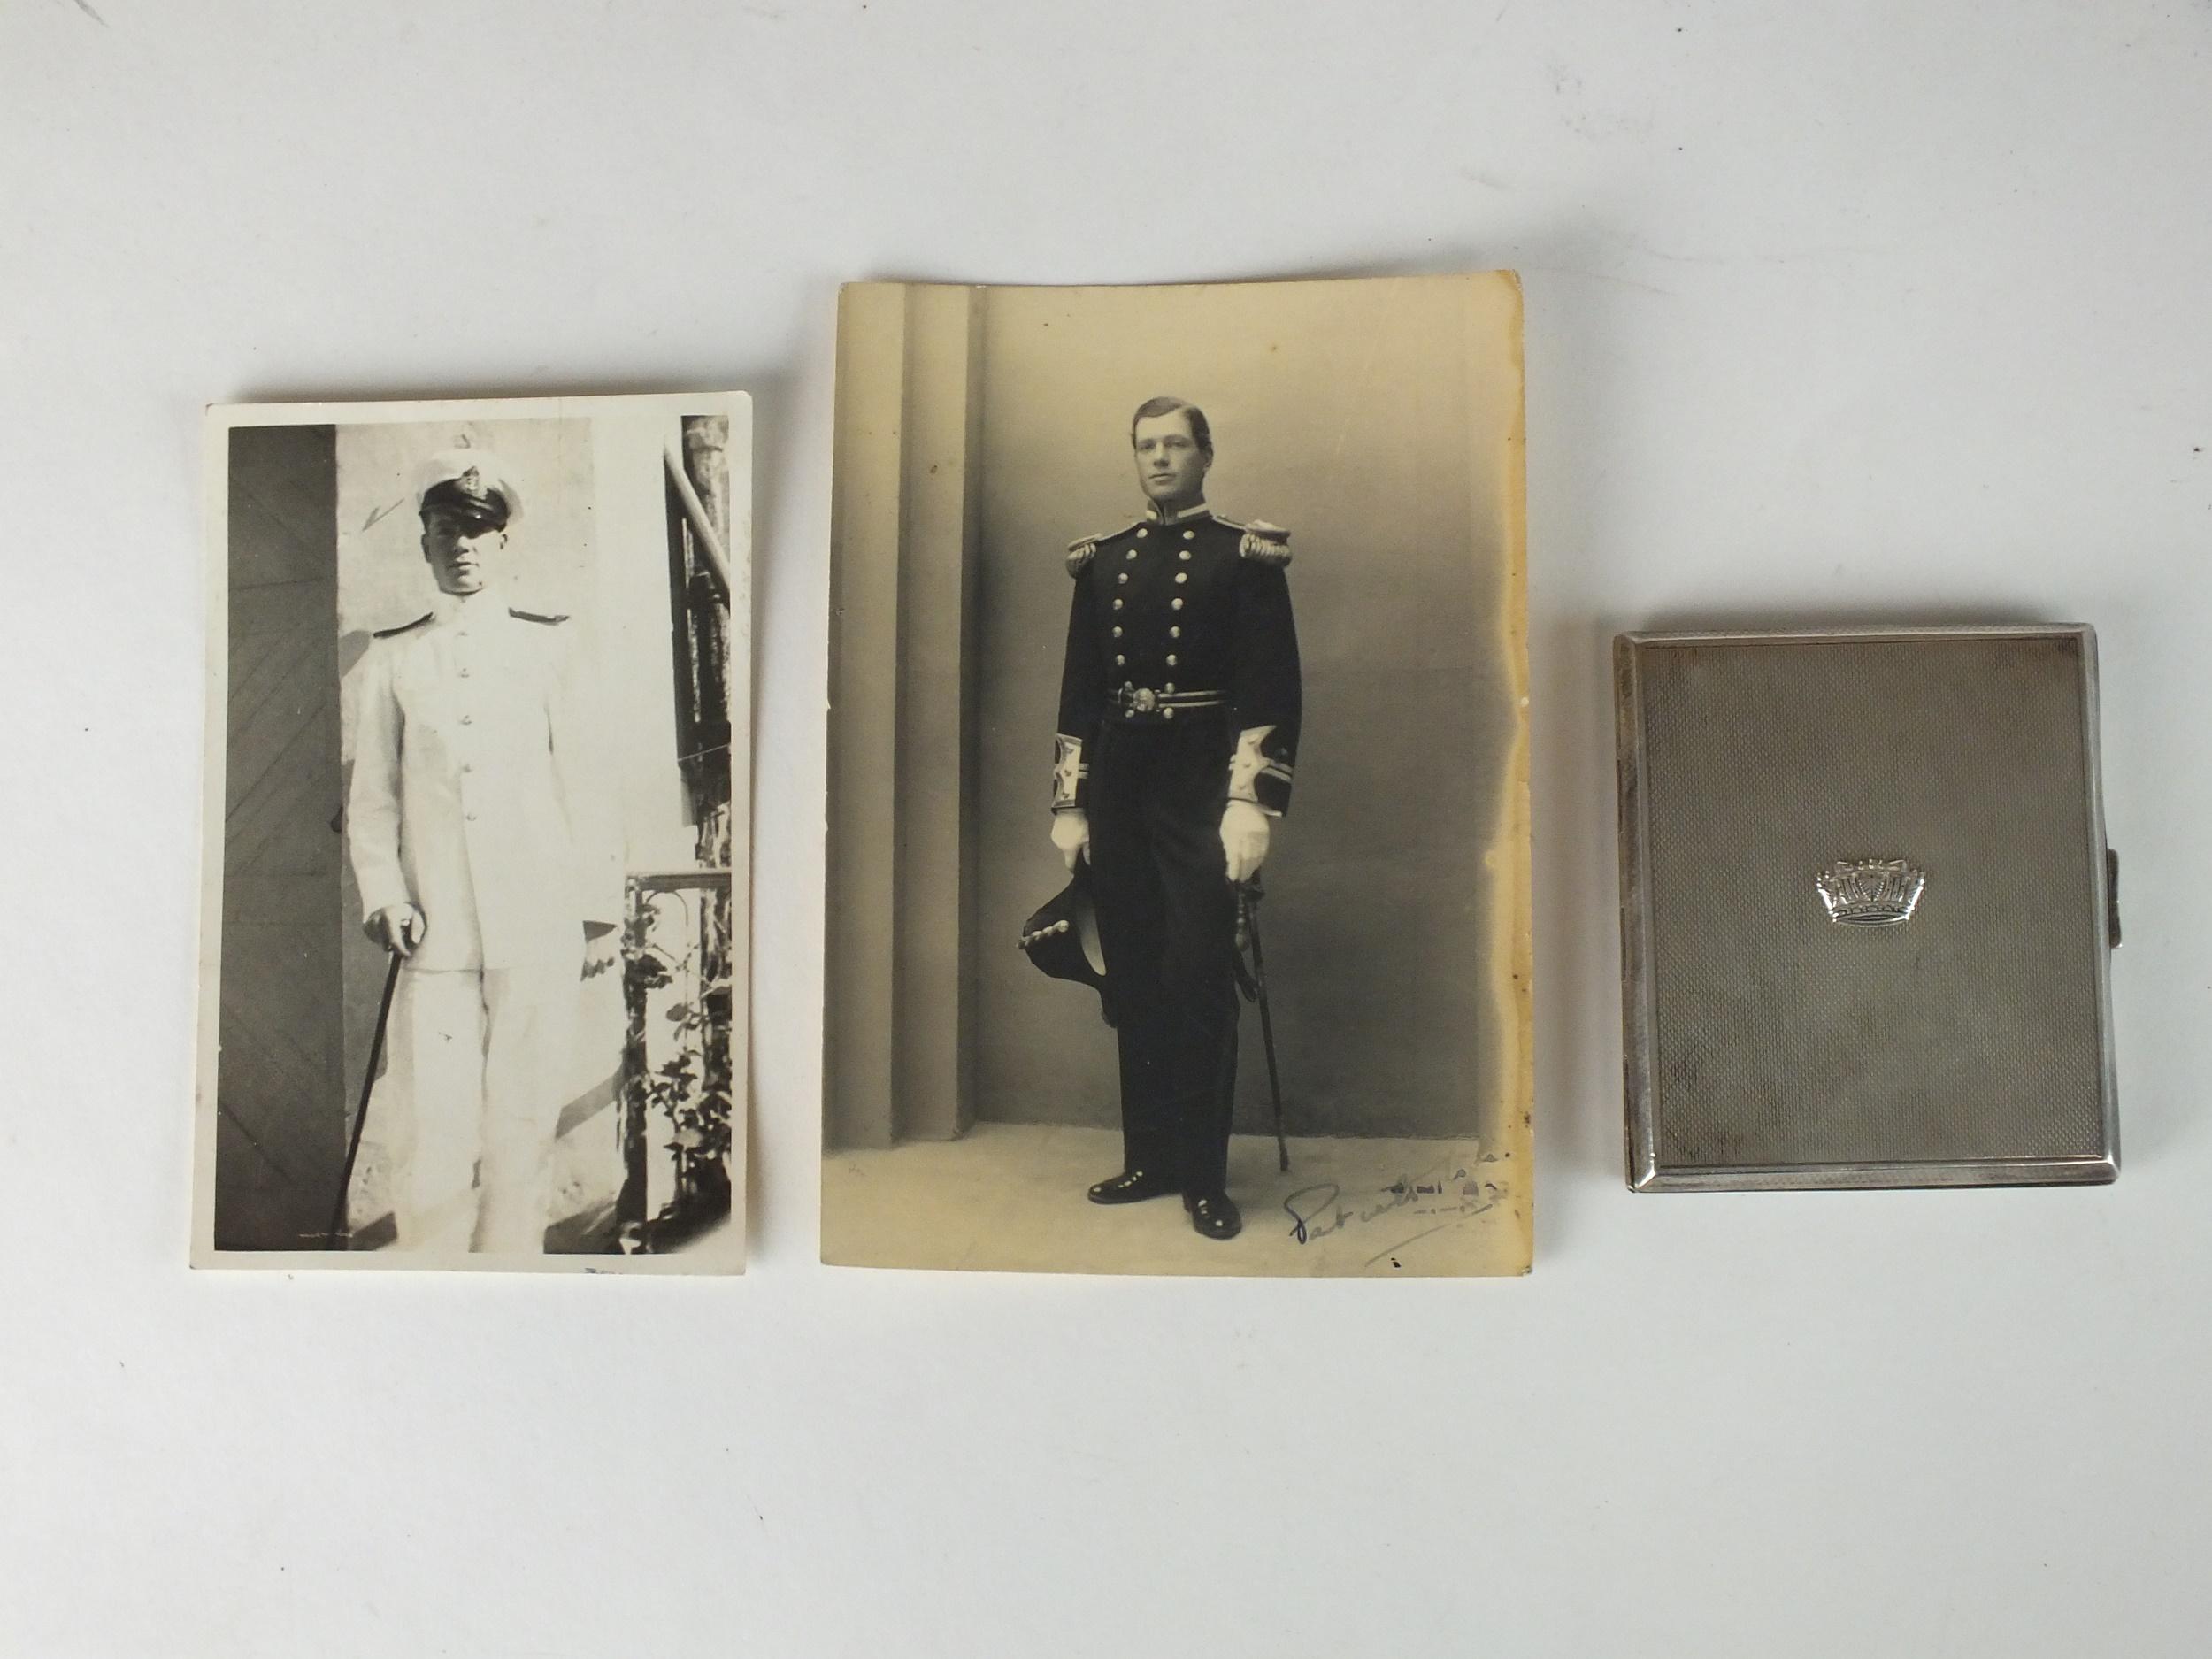 AUCTION HIGHLIGHT: Royal Naval Interest